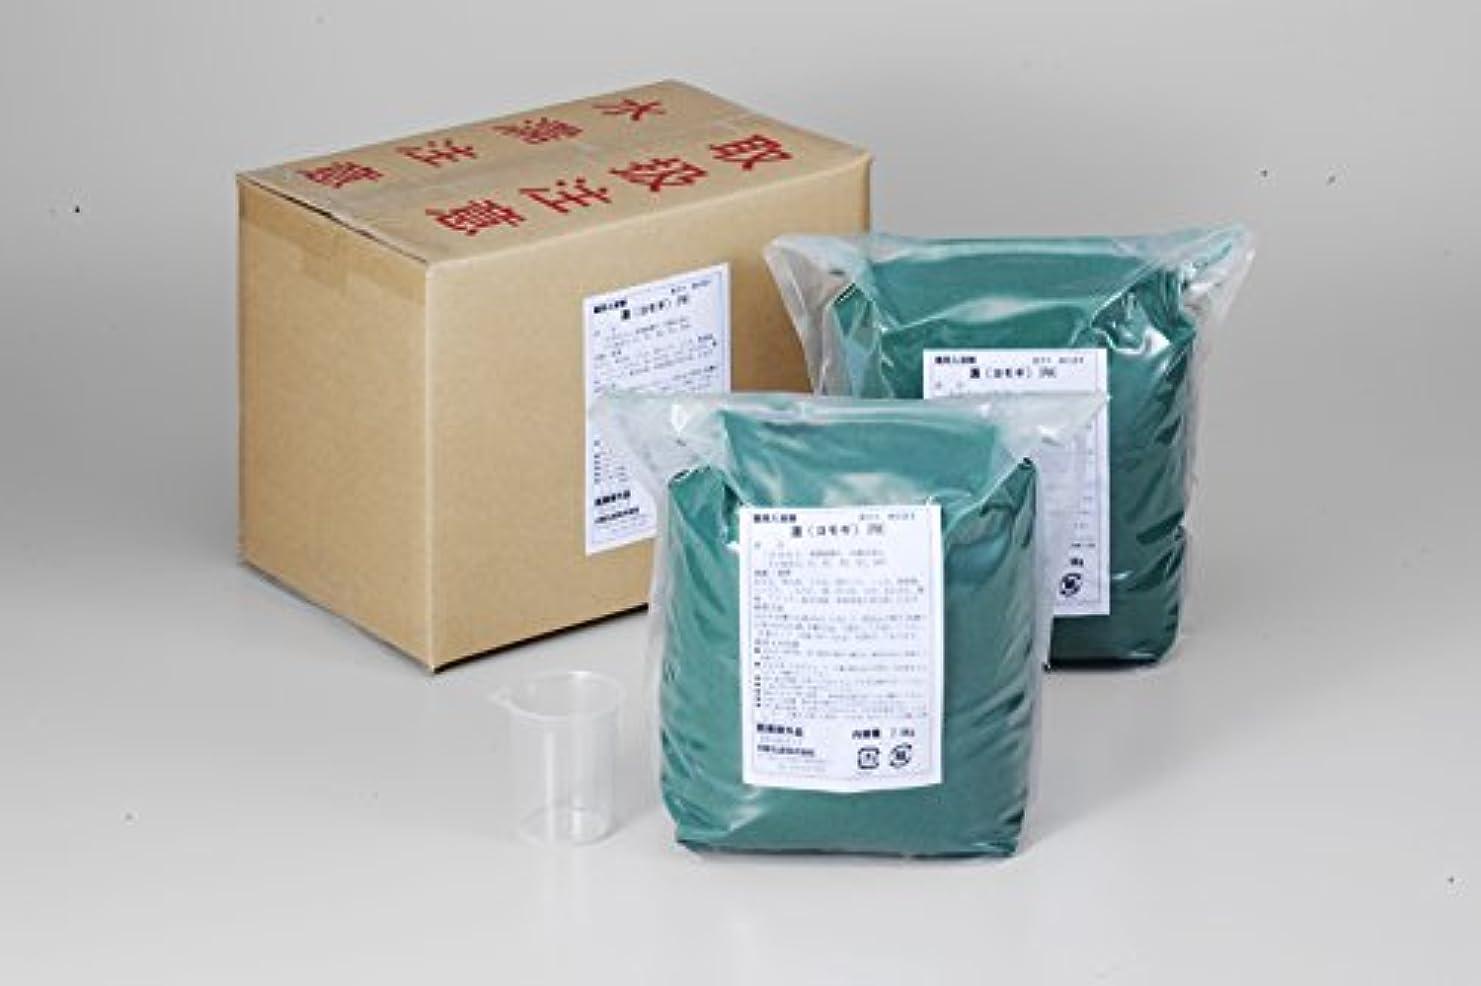 擬人化今日主流業務用入浴剤「ヨモギ」15kg(7.5kg×2)